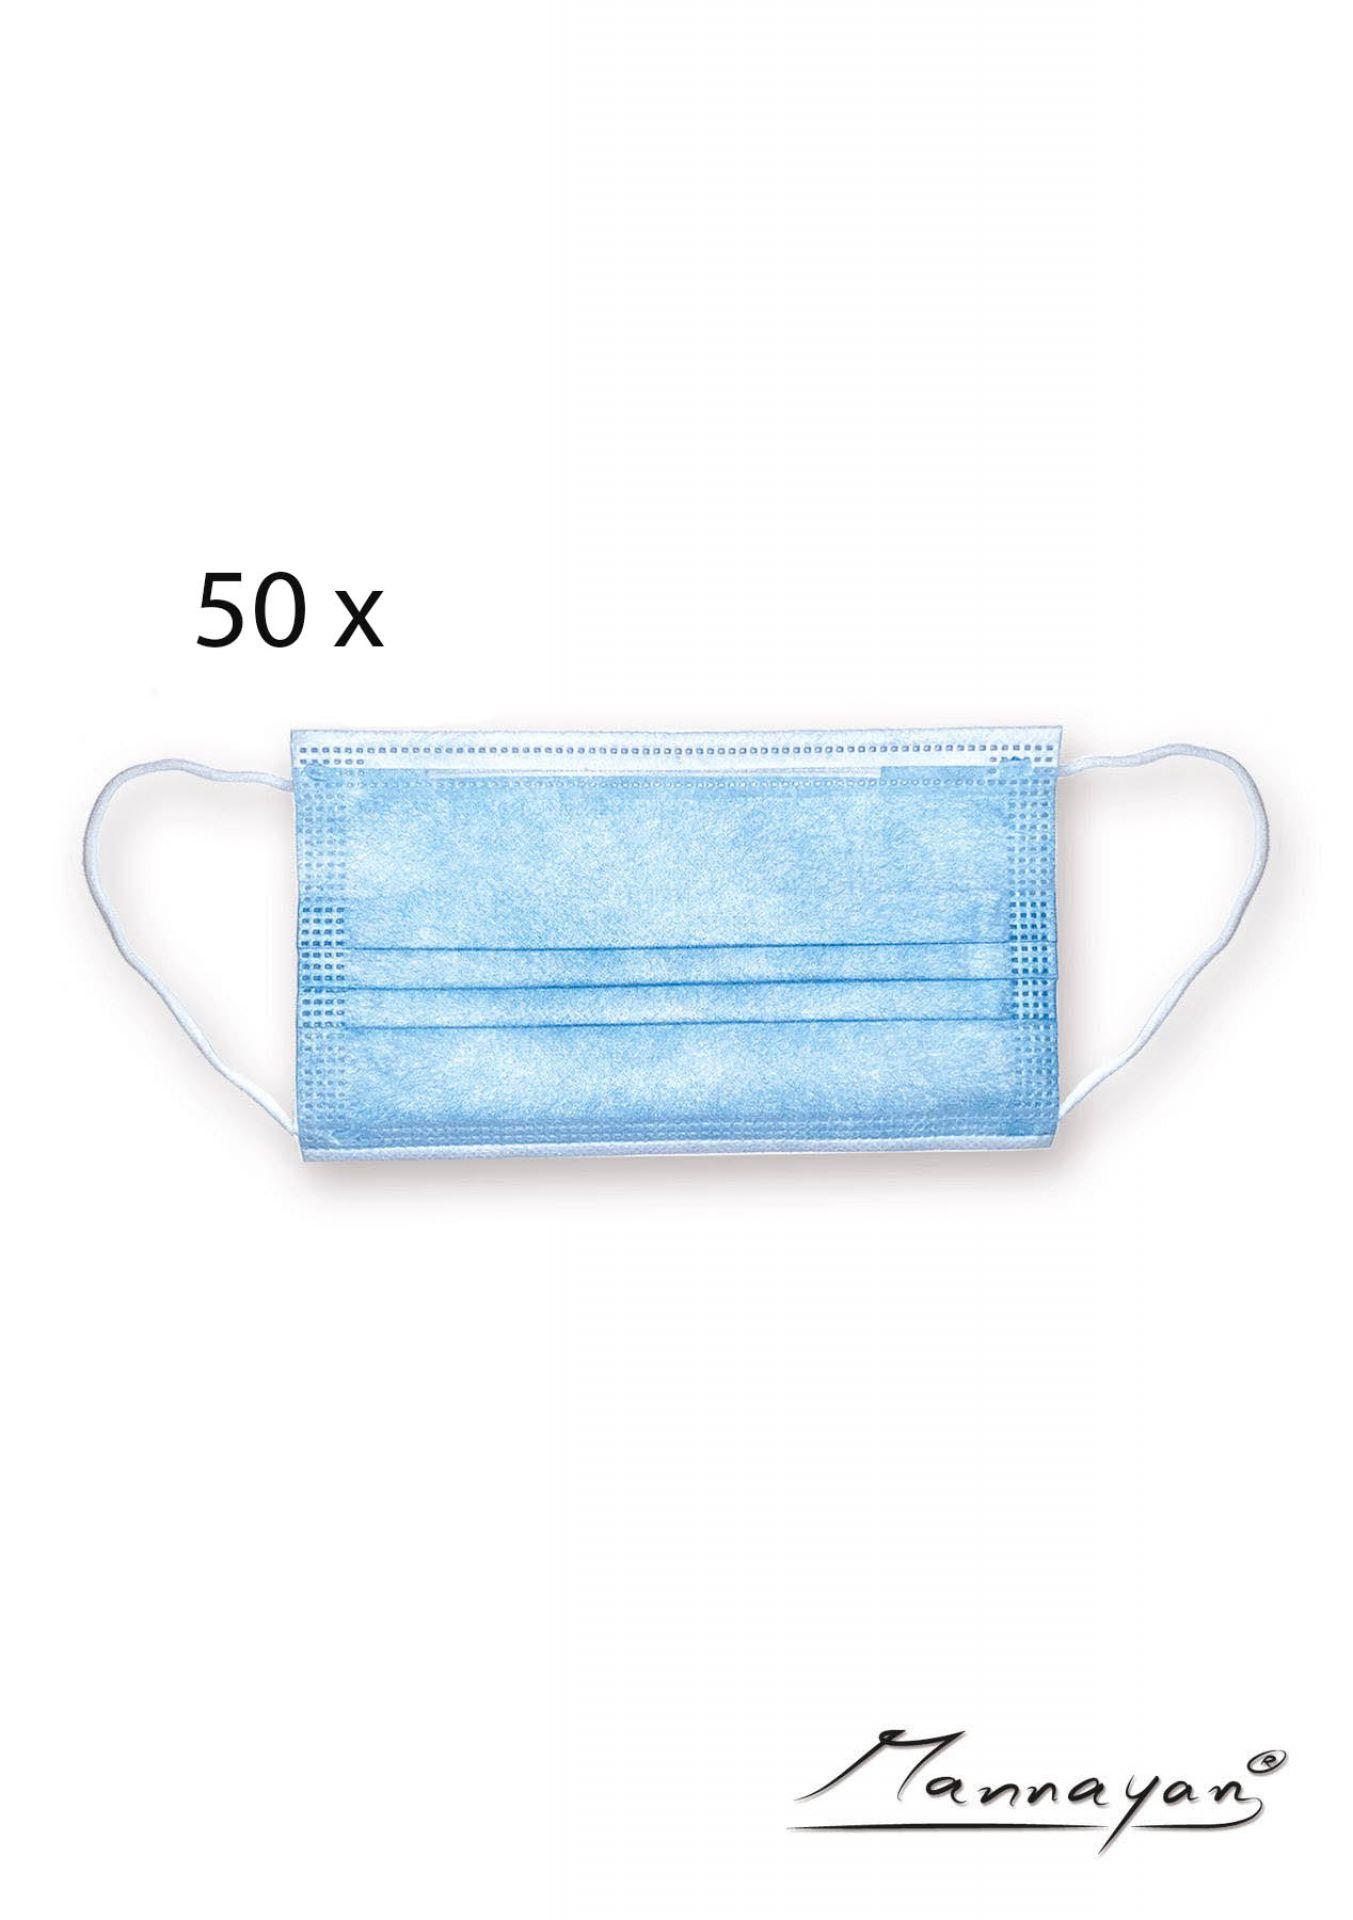 3-layer disposable masks (50 pieces)